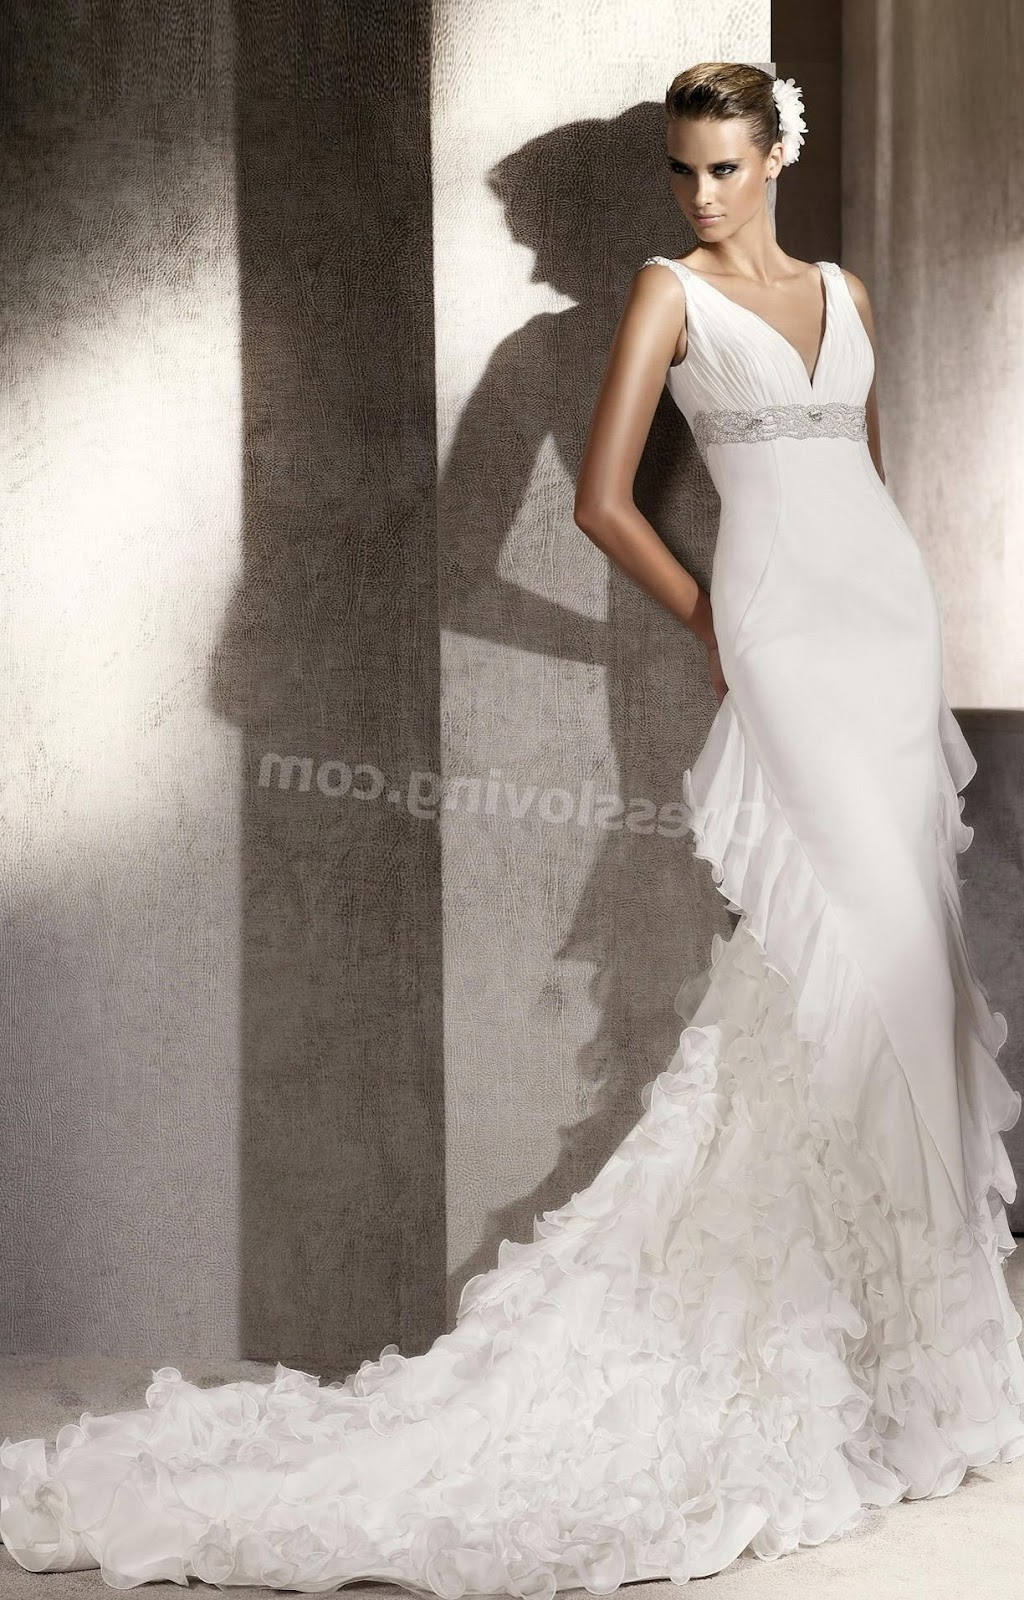 Romantic Satin Organza Empire Cathedral Train V neck backless wedding dress